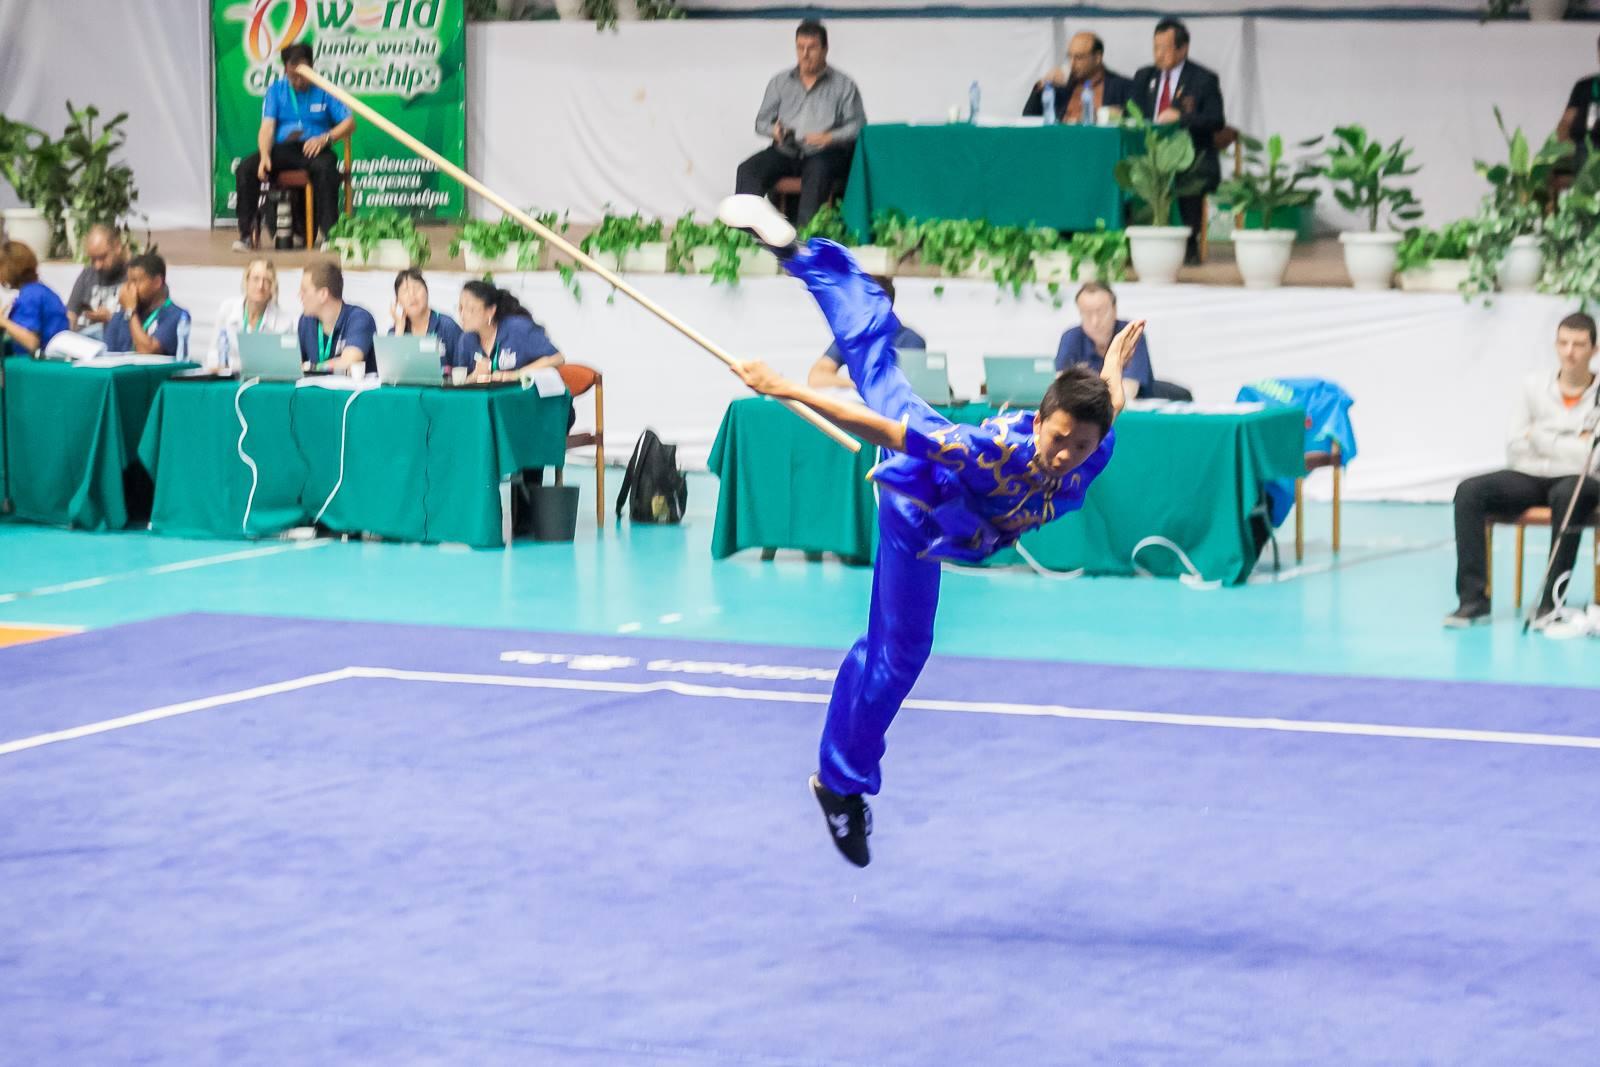 Wayland_Li_World_Wushu_Championships_Staff_Gunshu_2016_Bulgaria_Canada.jpg